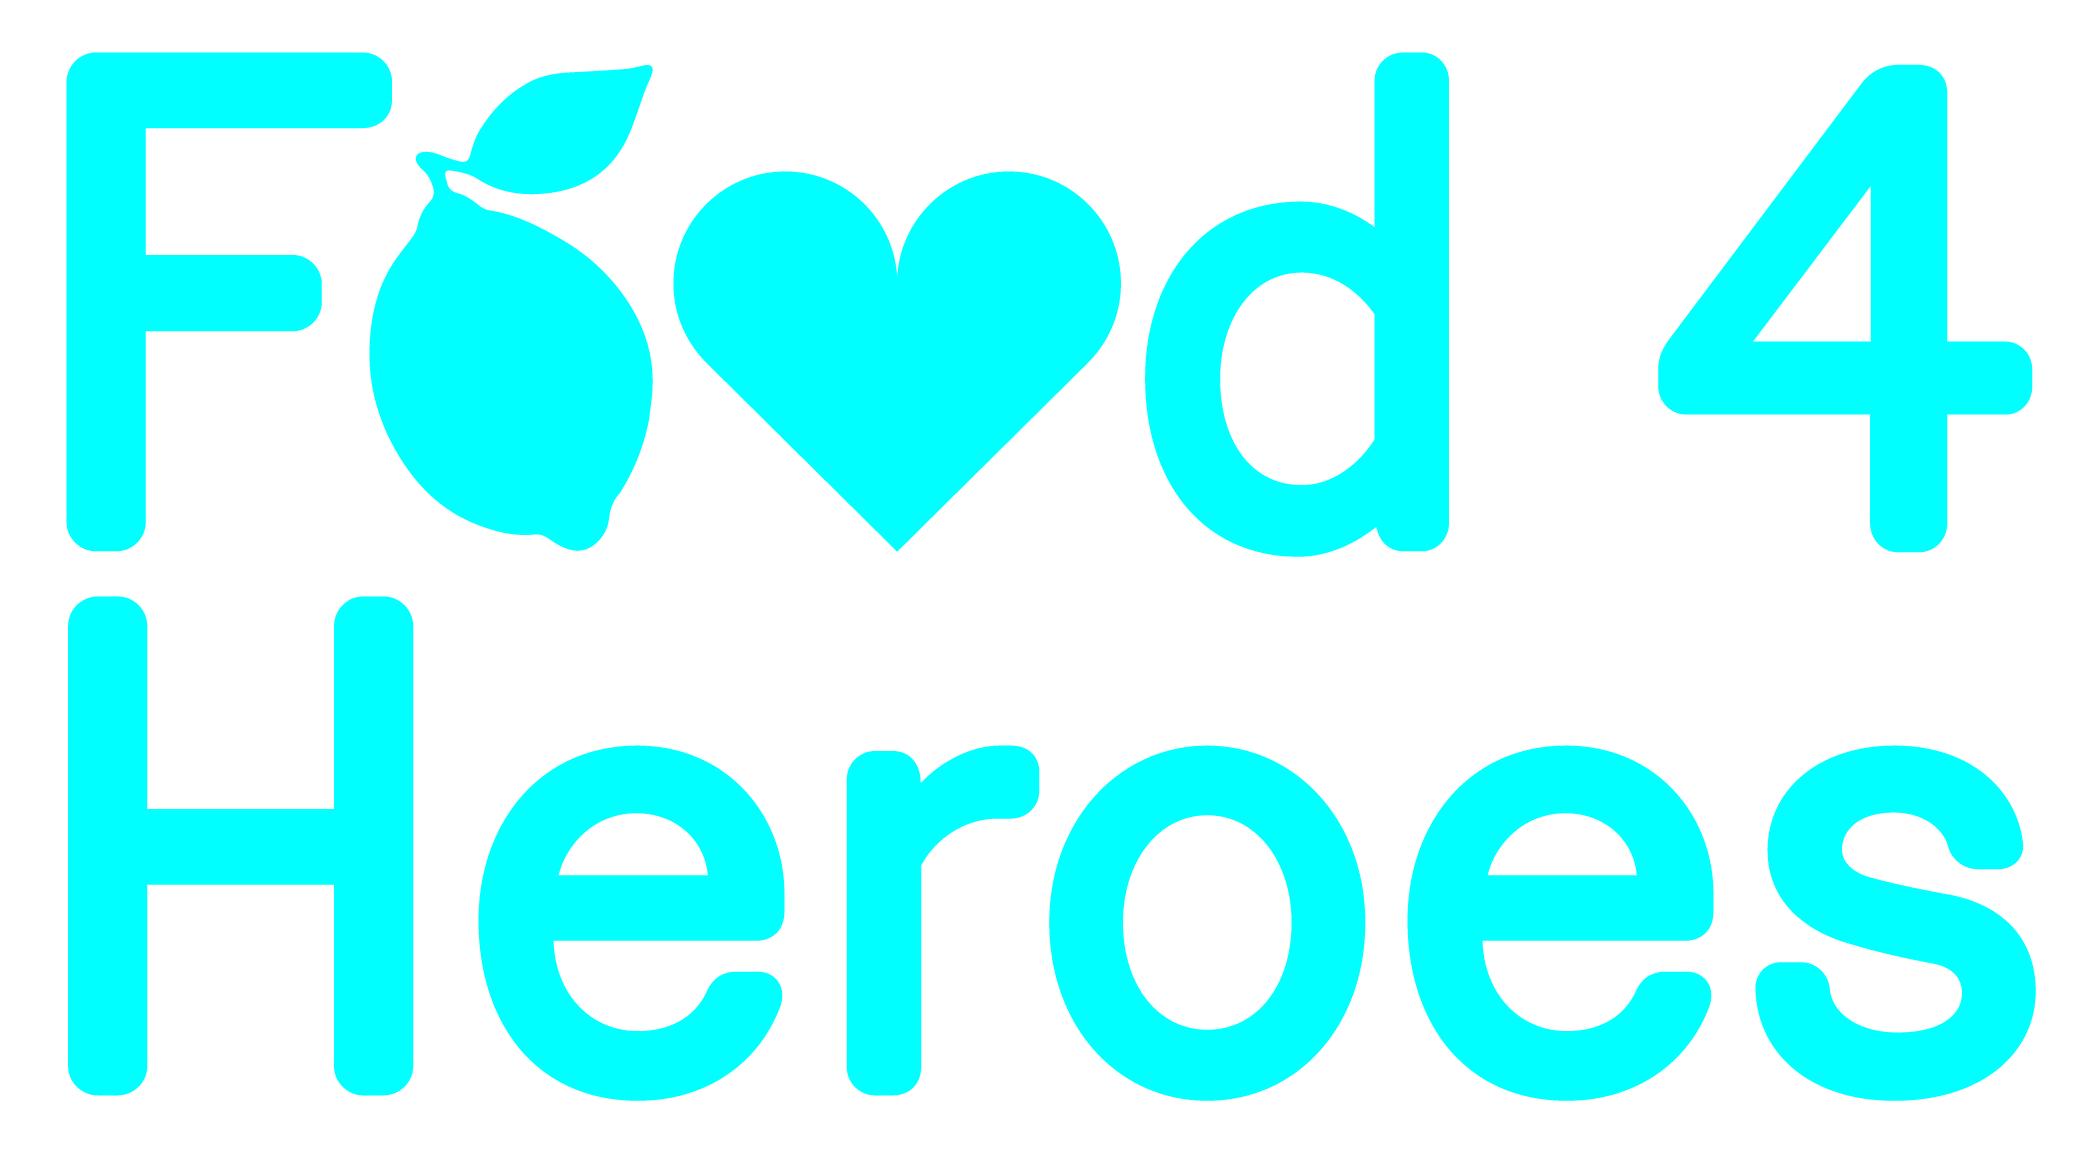 The Food 4 Heroes logo in blue